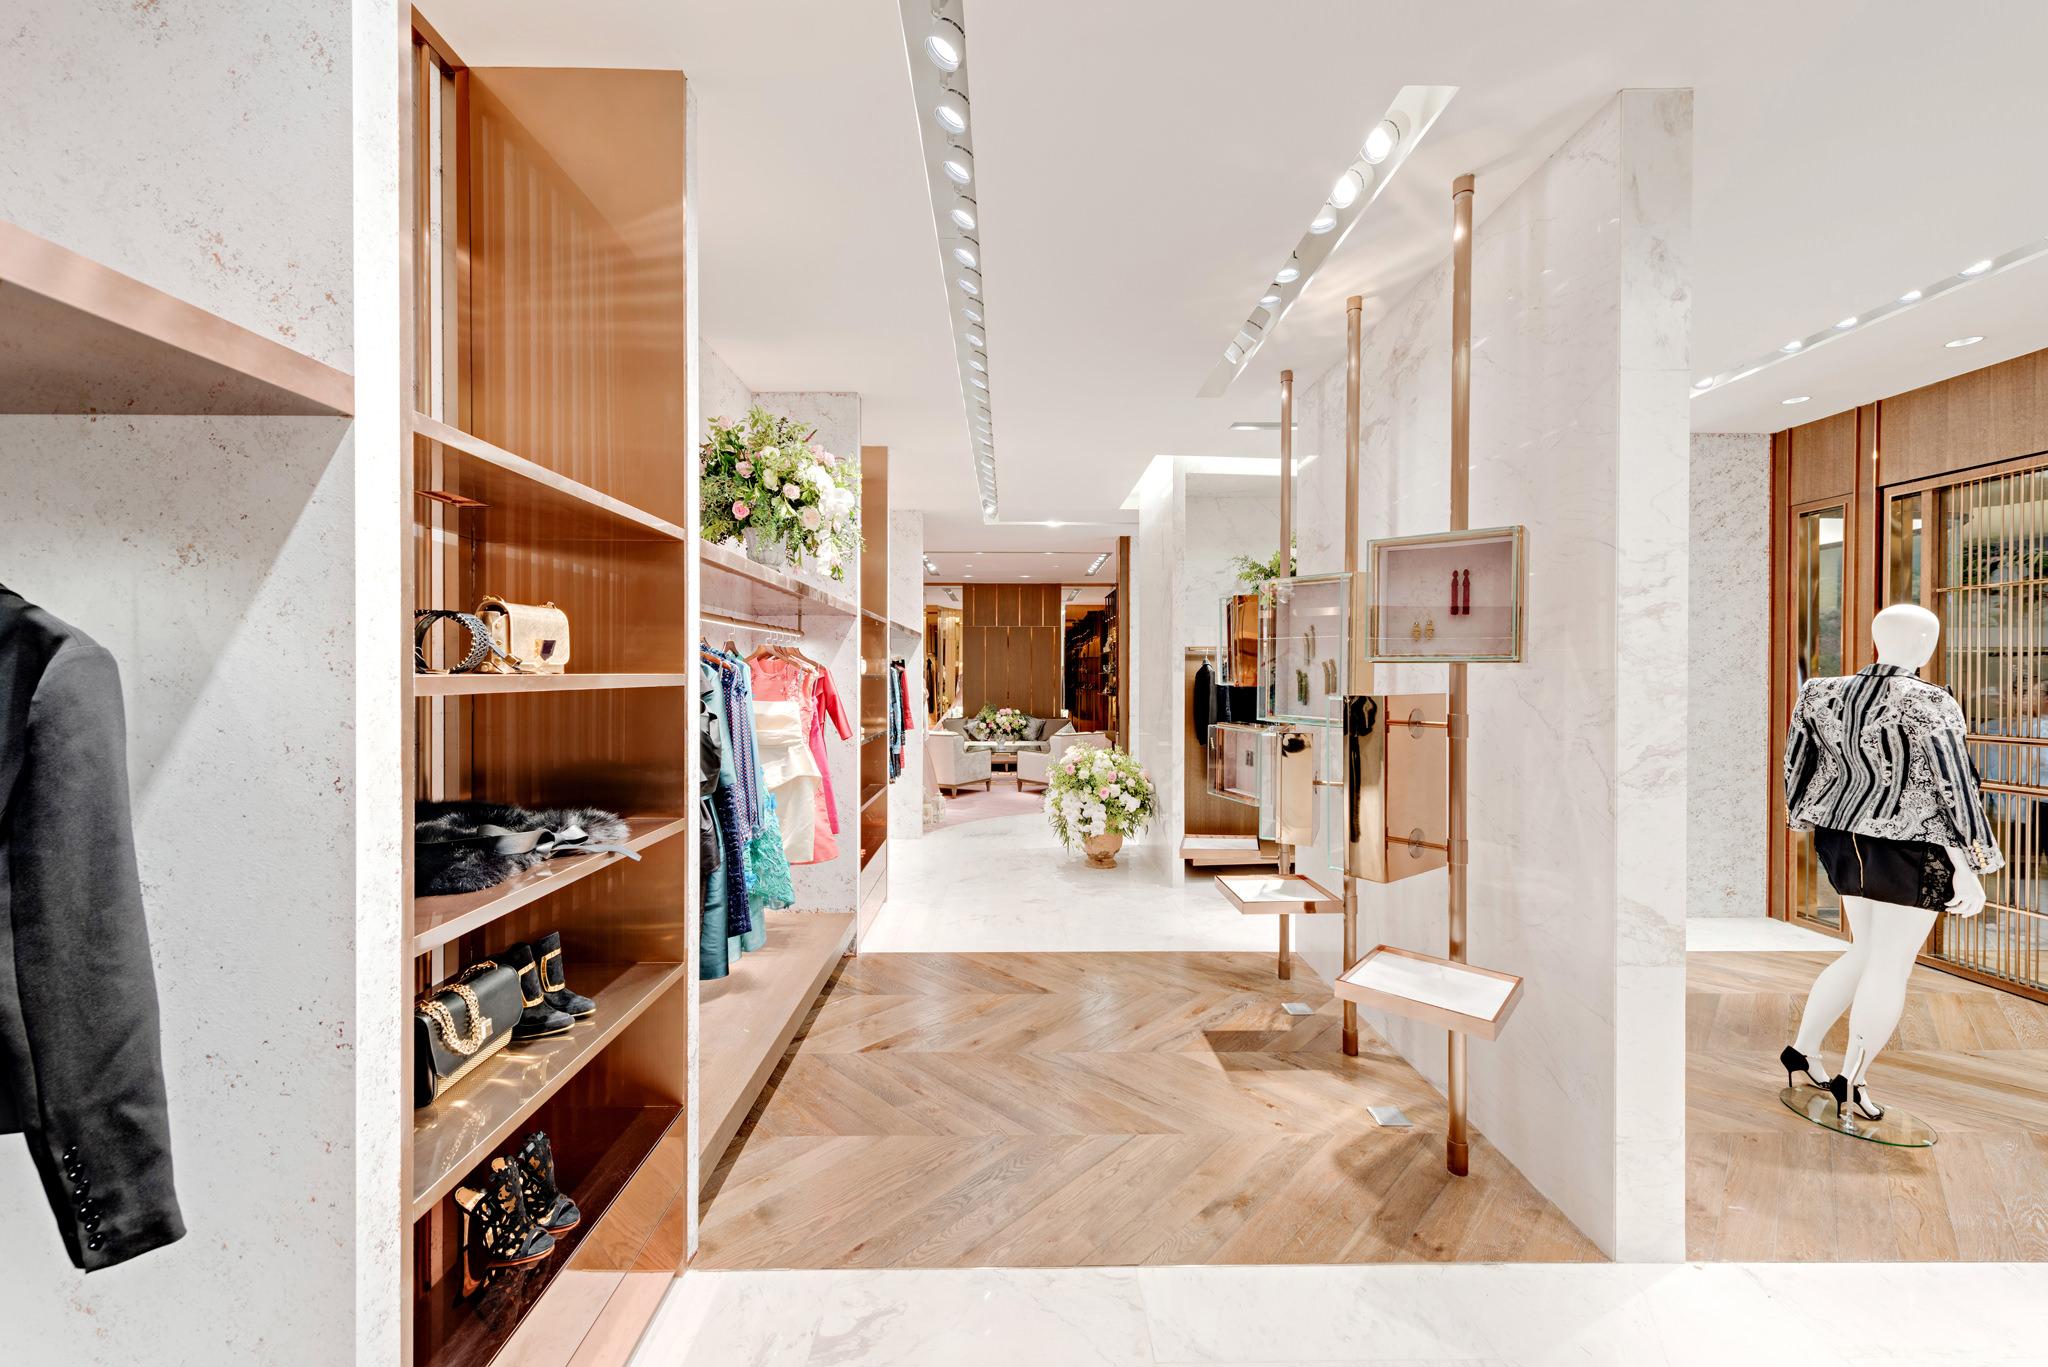 20161224 - Jacqueline - HCM - Commercial - Interior - Store - Retouch 0009.jpg